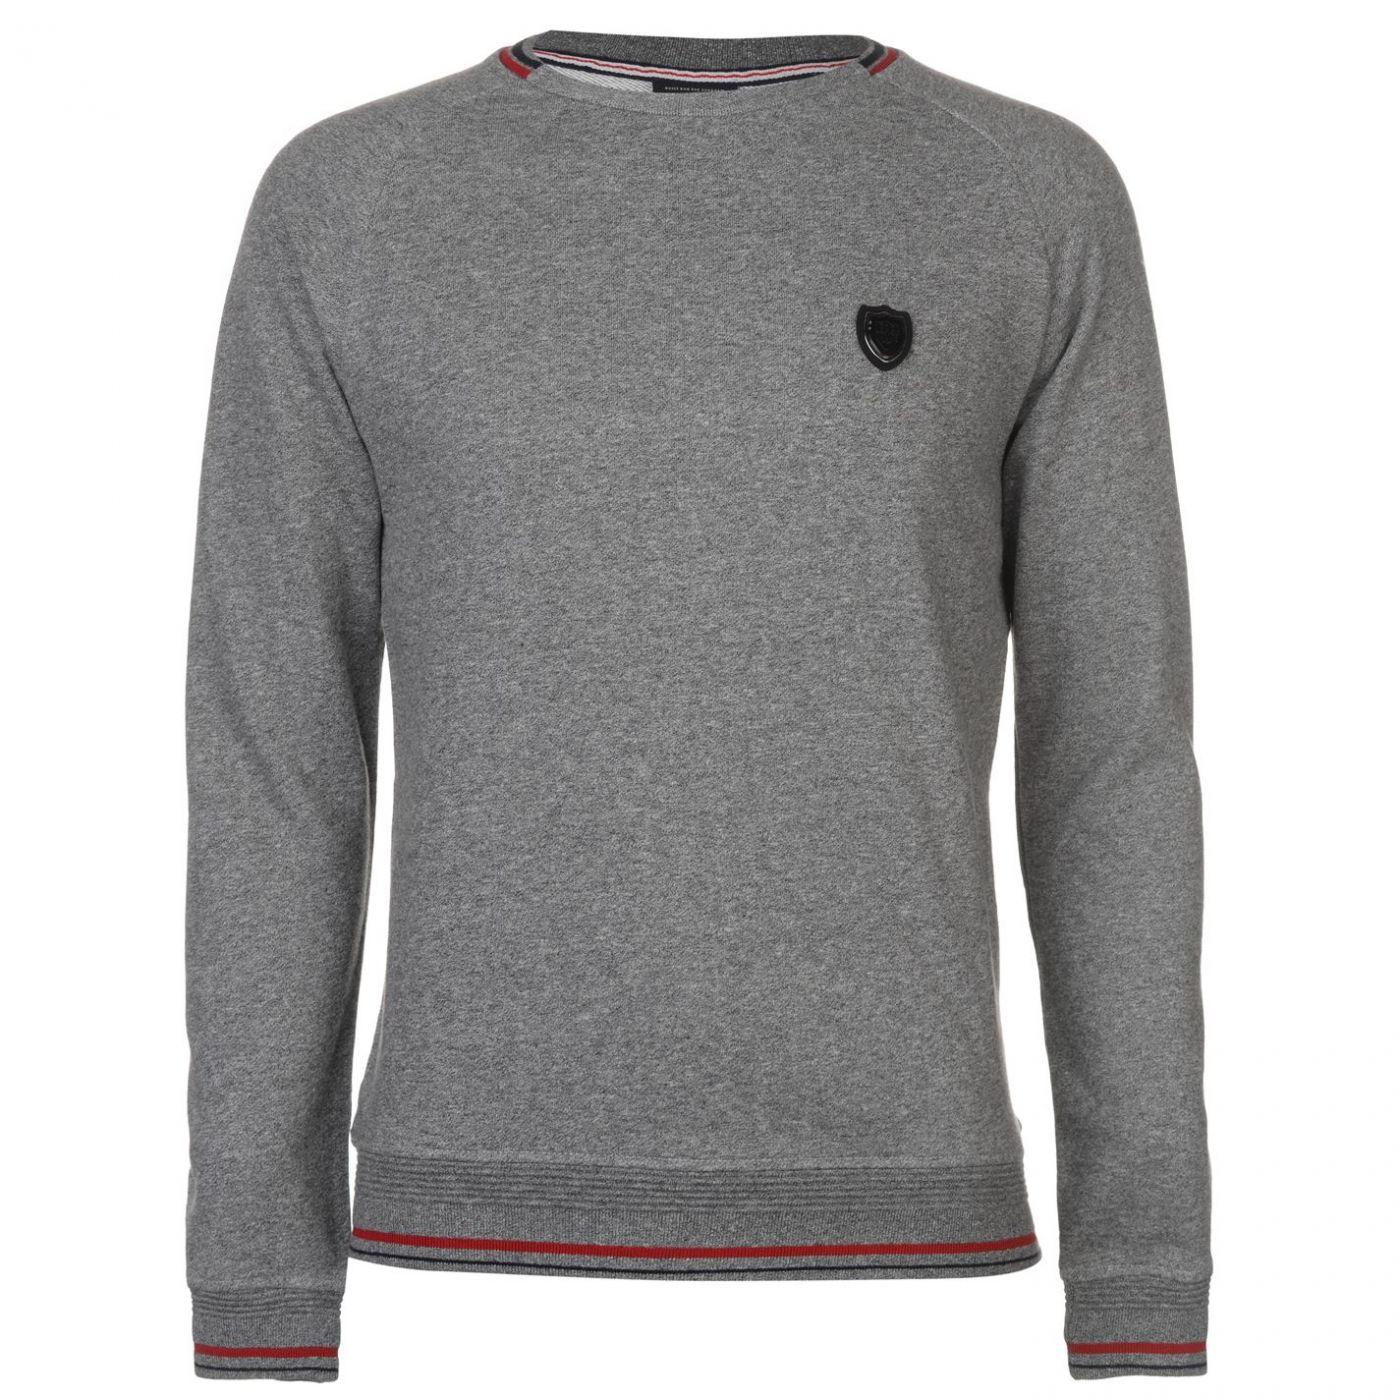 Levis Serif Graphic Sweatshirt